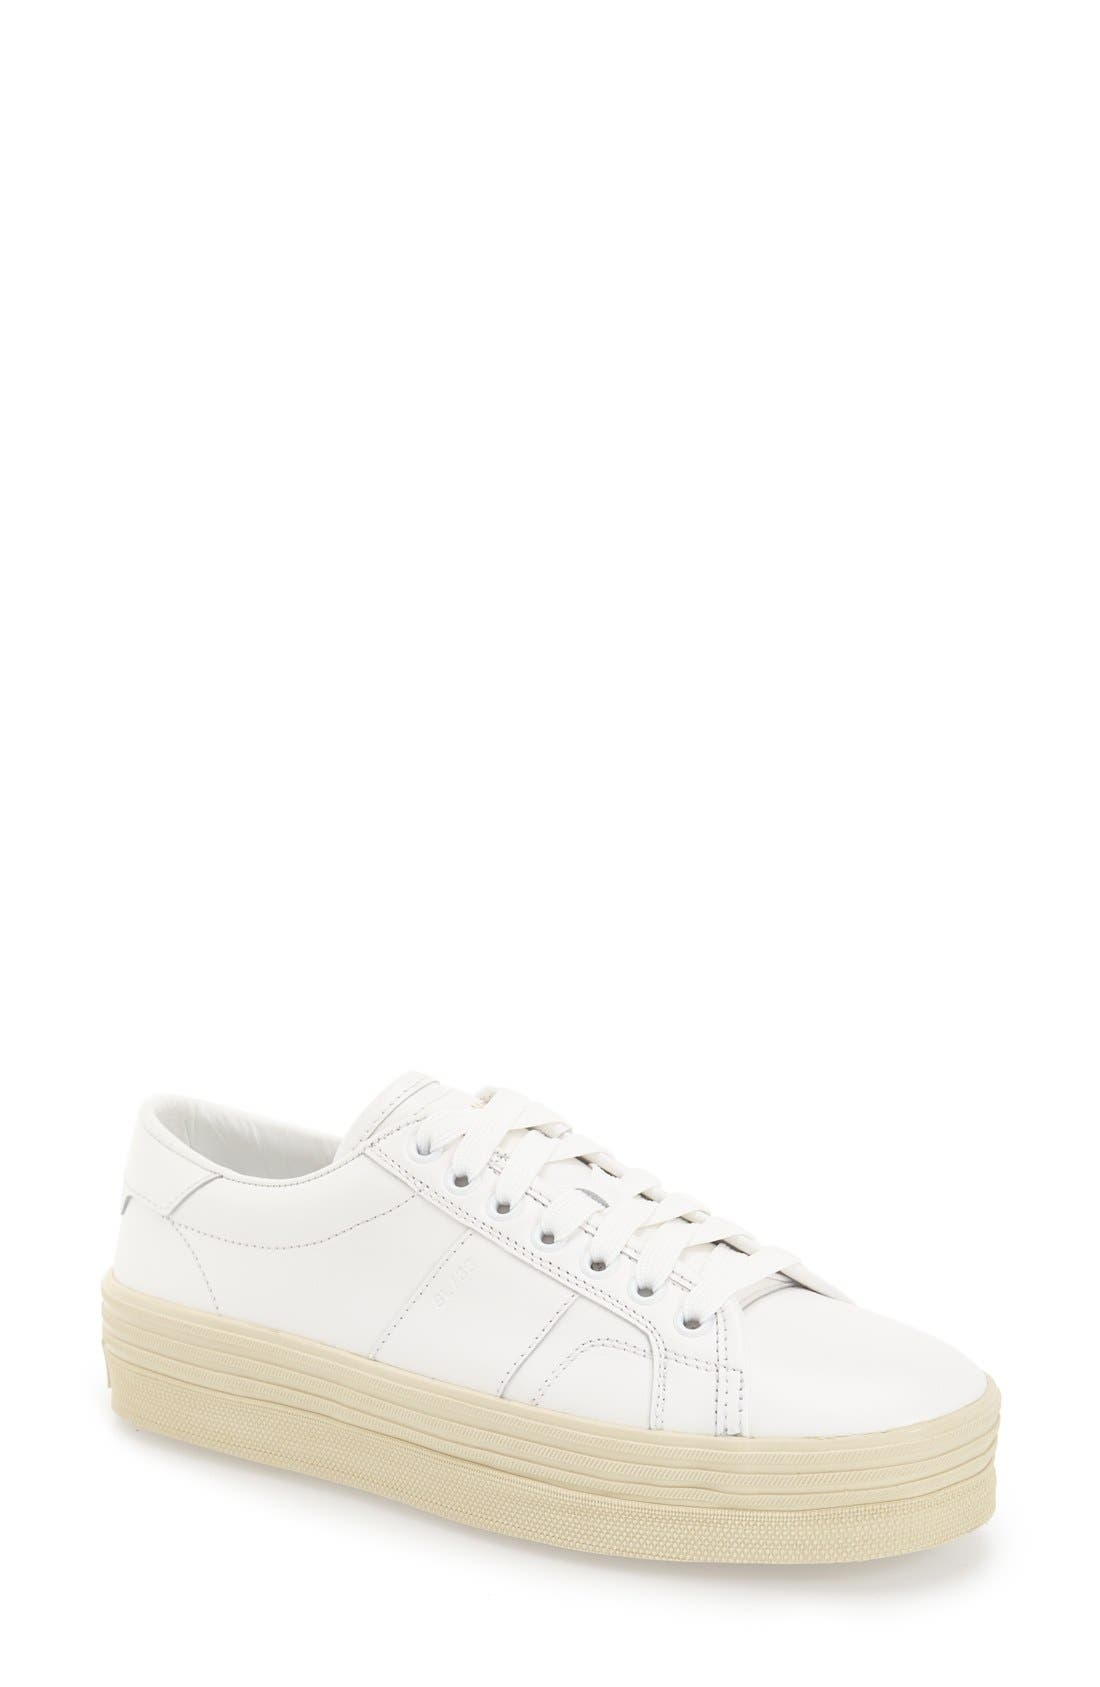 Saint Laurent Double Sole Sneaker (Women)